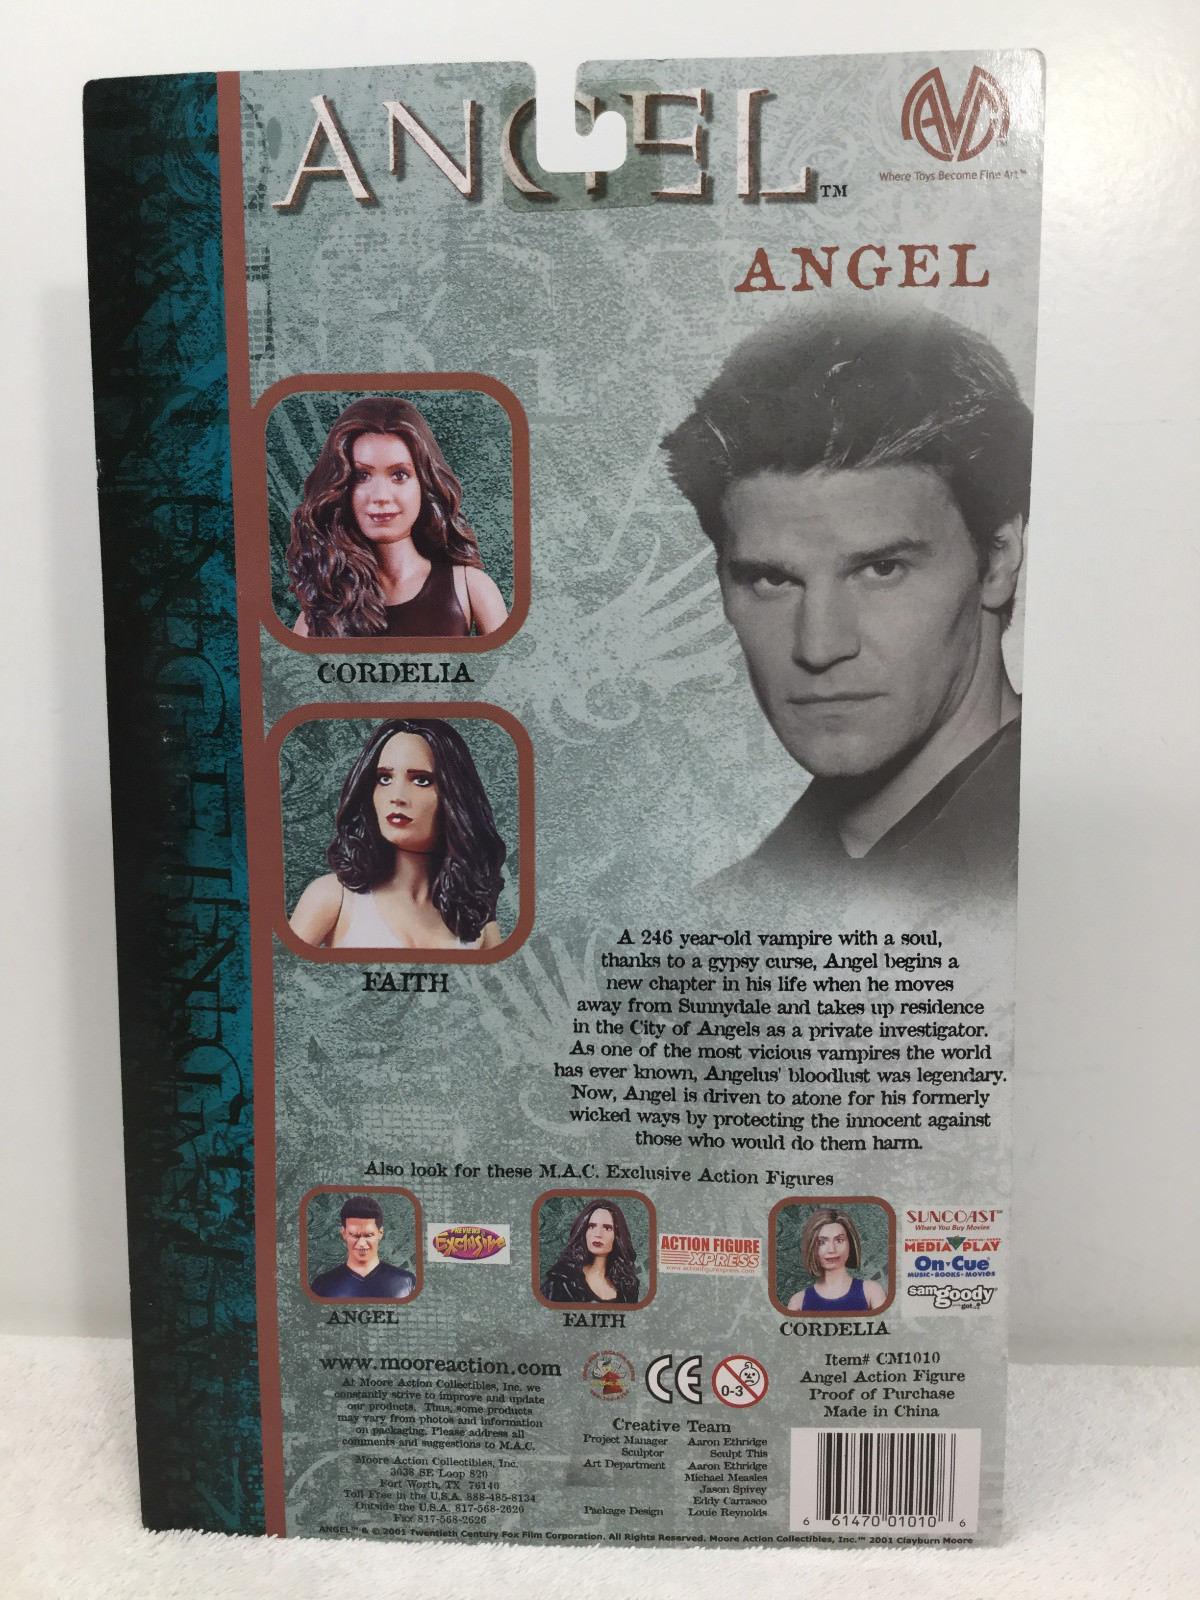 "Angel 6"" Angel Action Figure Regular Ver. Season 1 - Moore Action FS 2001"